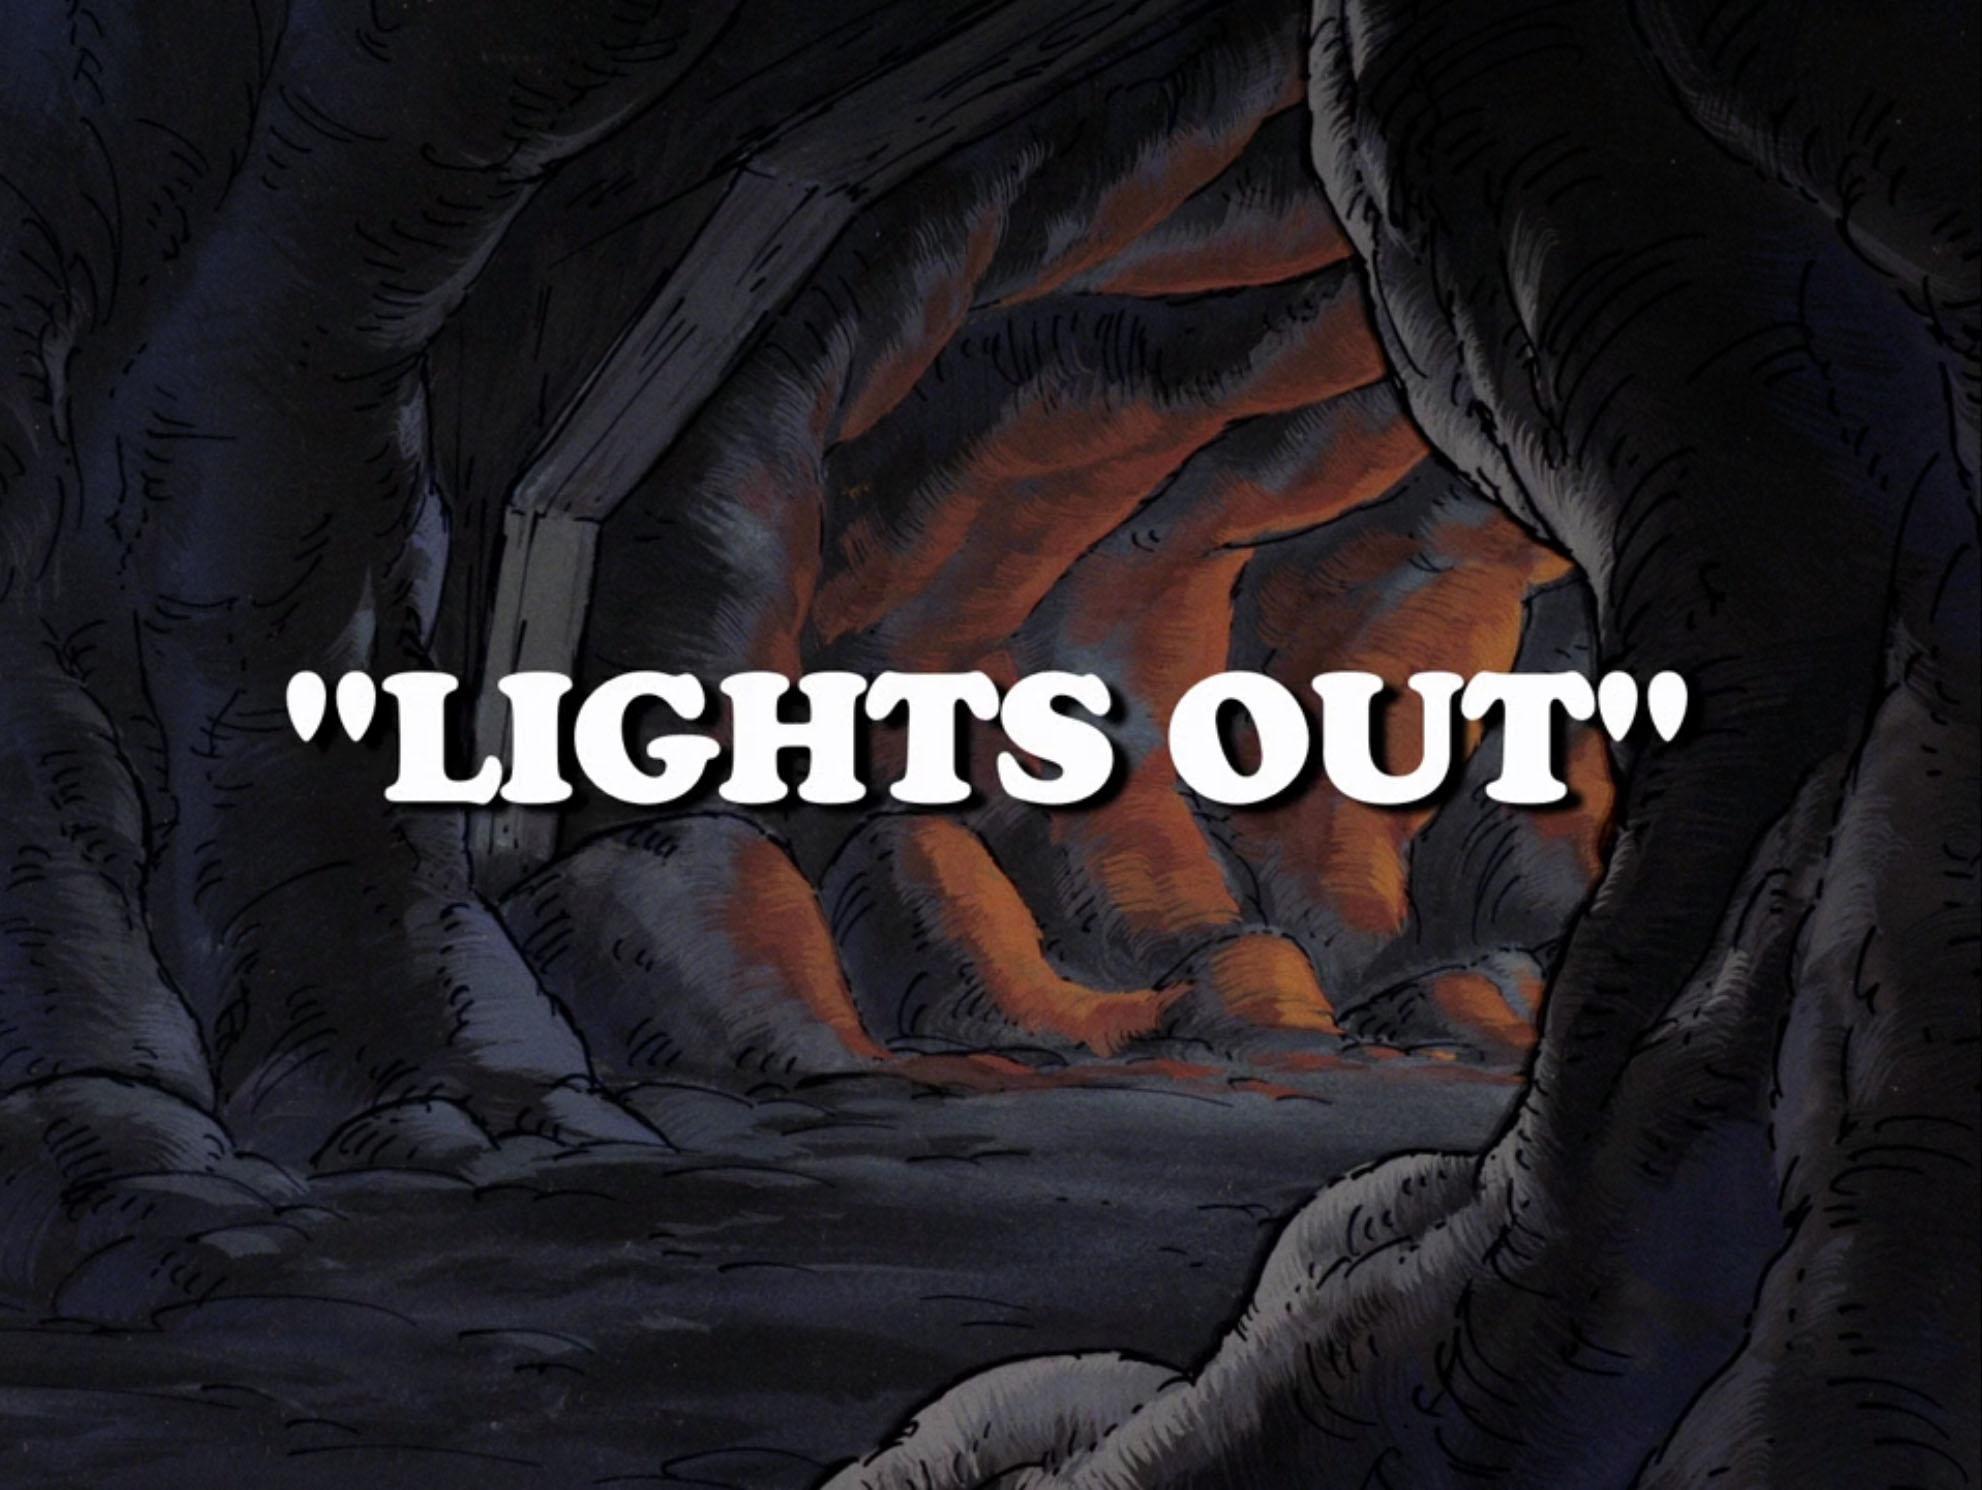 File:Lights Out.jpg